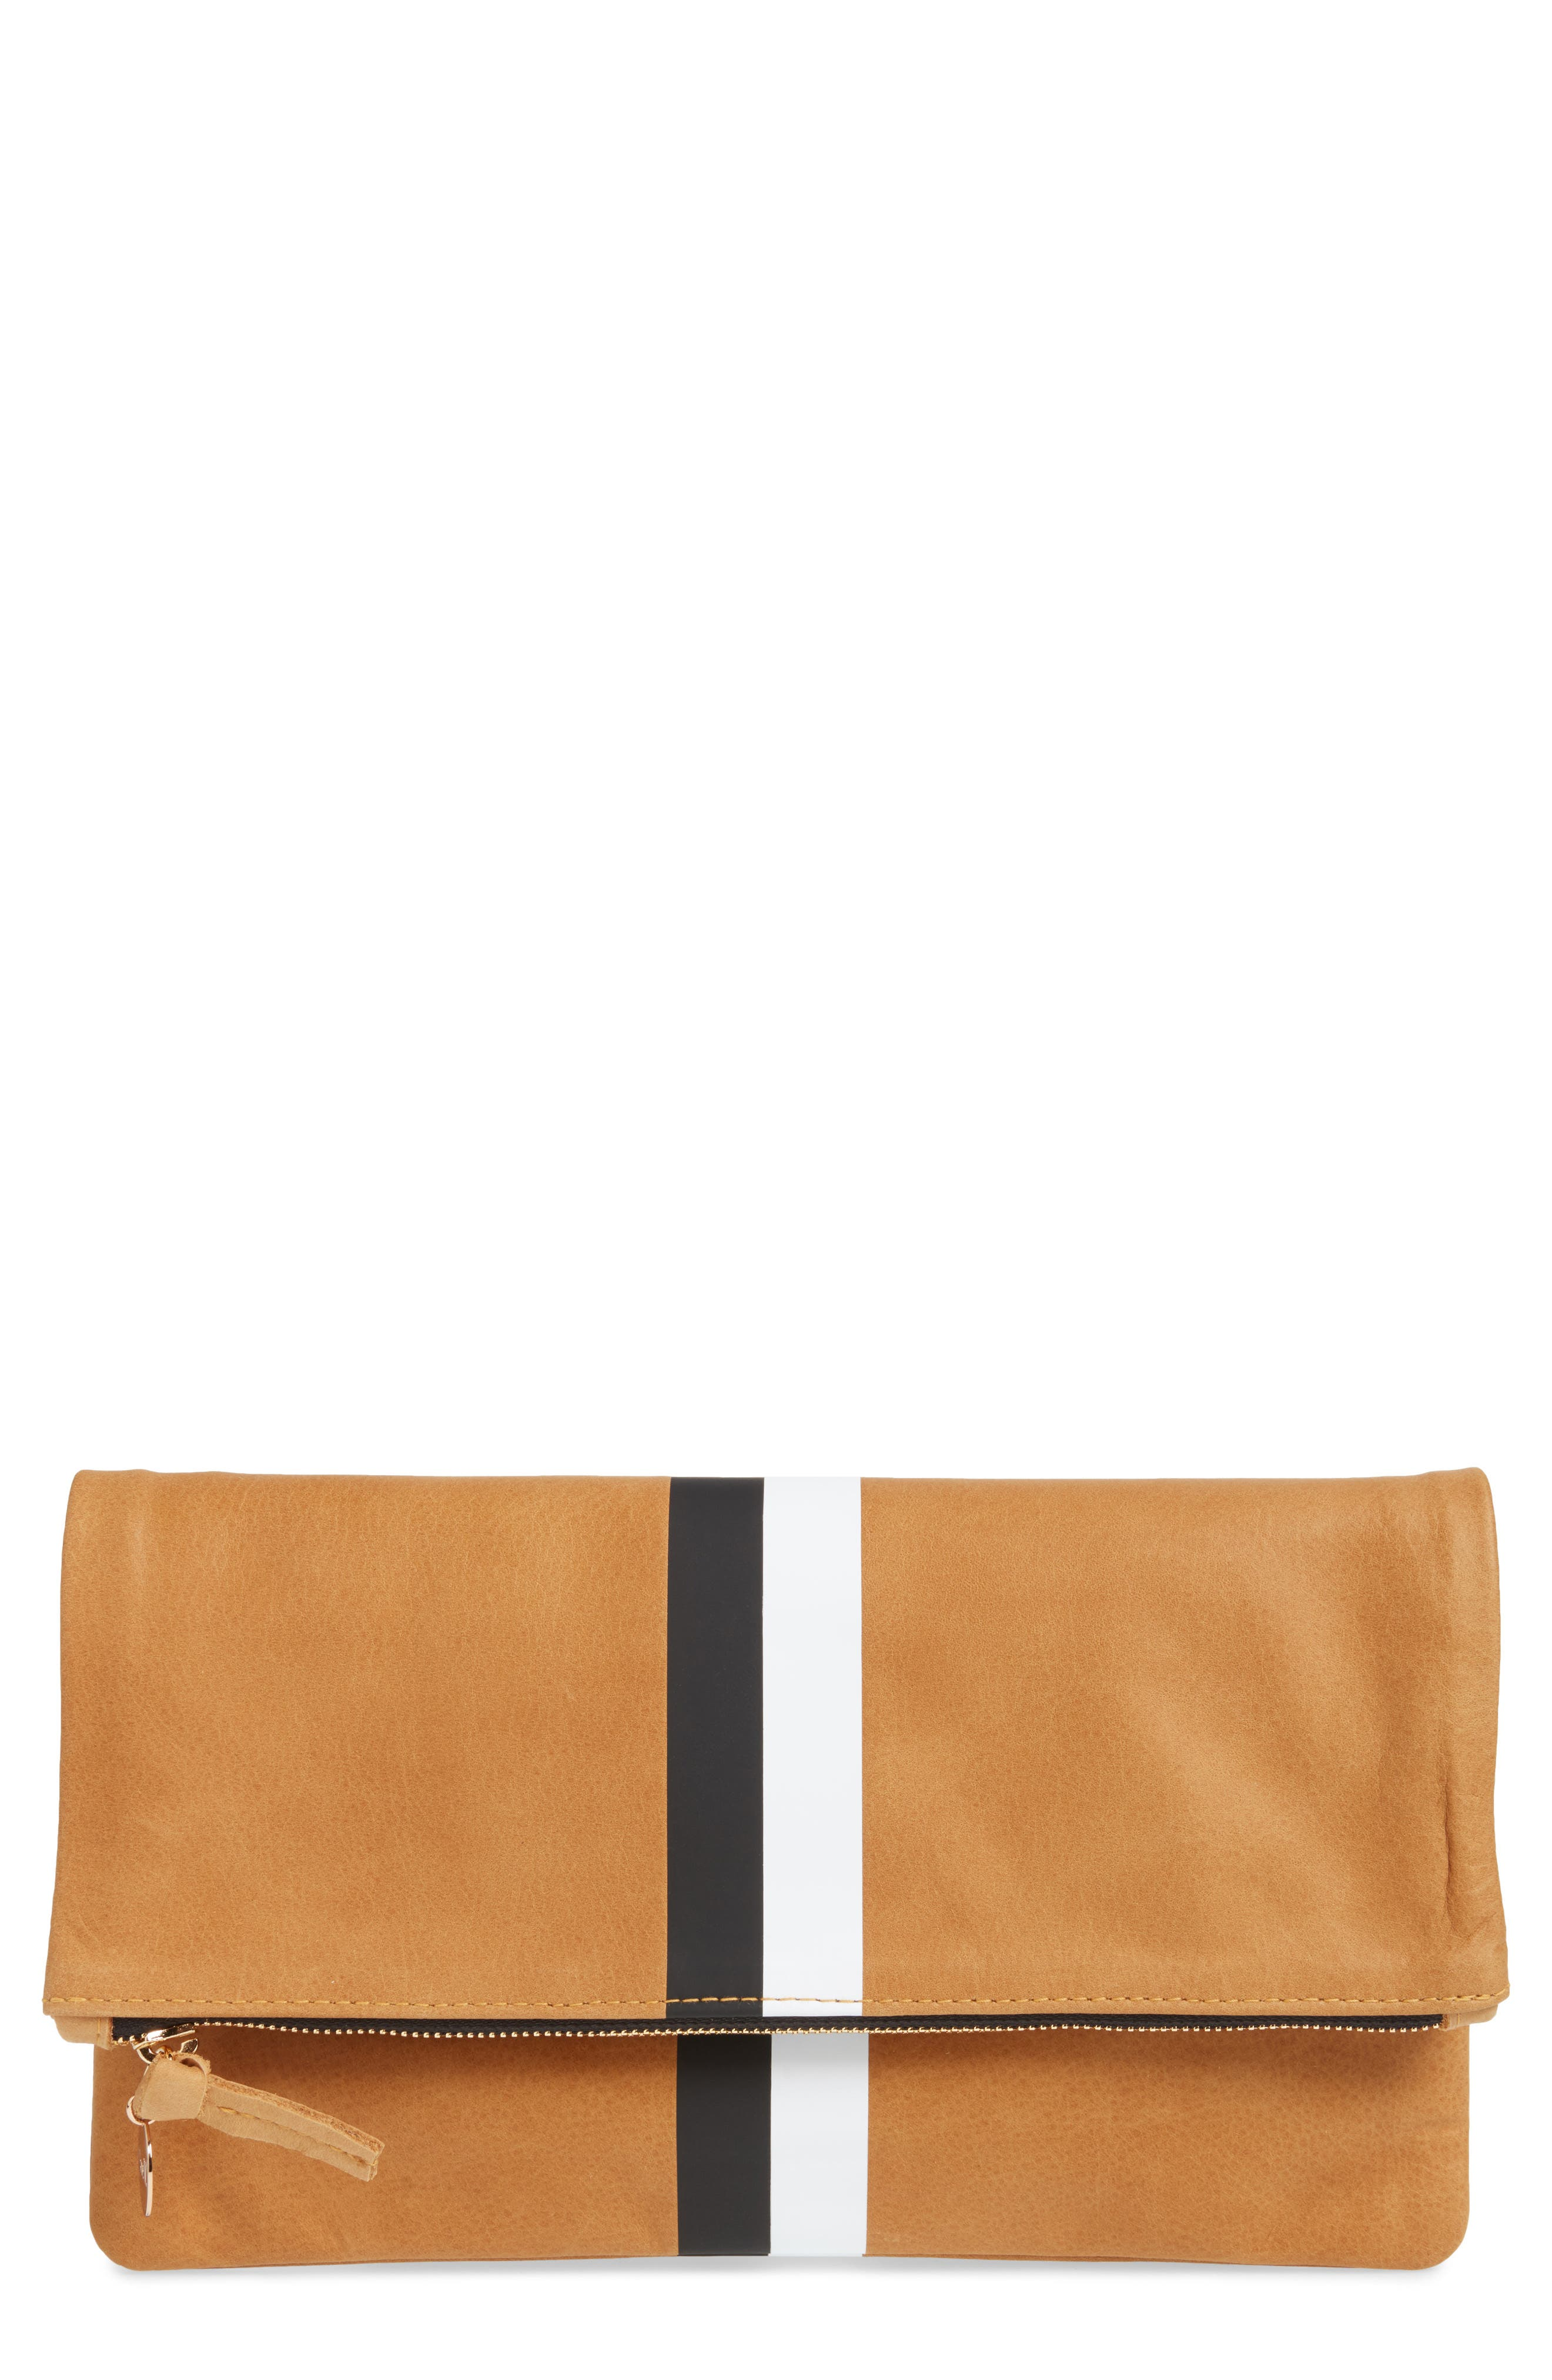 Center Stripe Leather Foldover Clutch,                             Main thumbnail 1, color,                             Nubuck Blck Whte Stripe